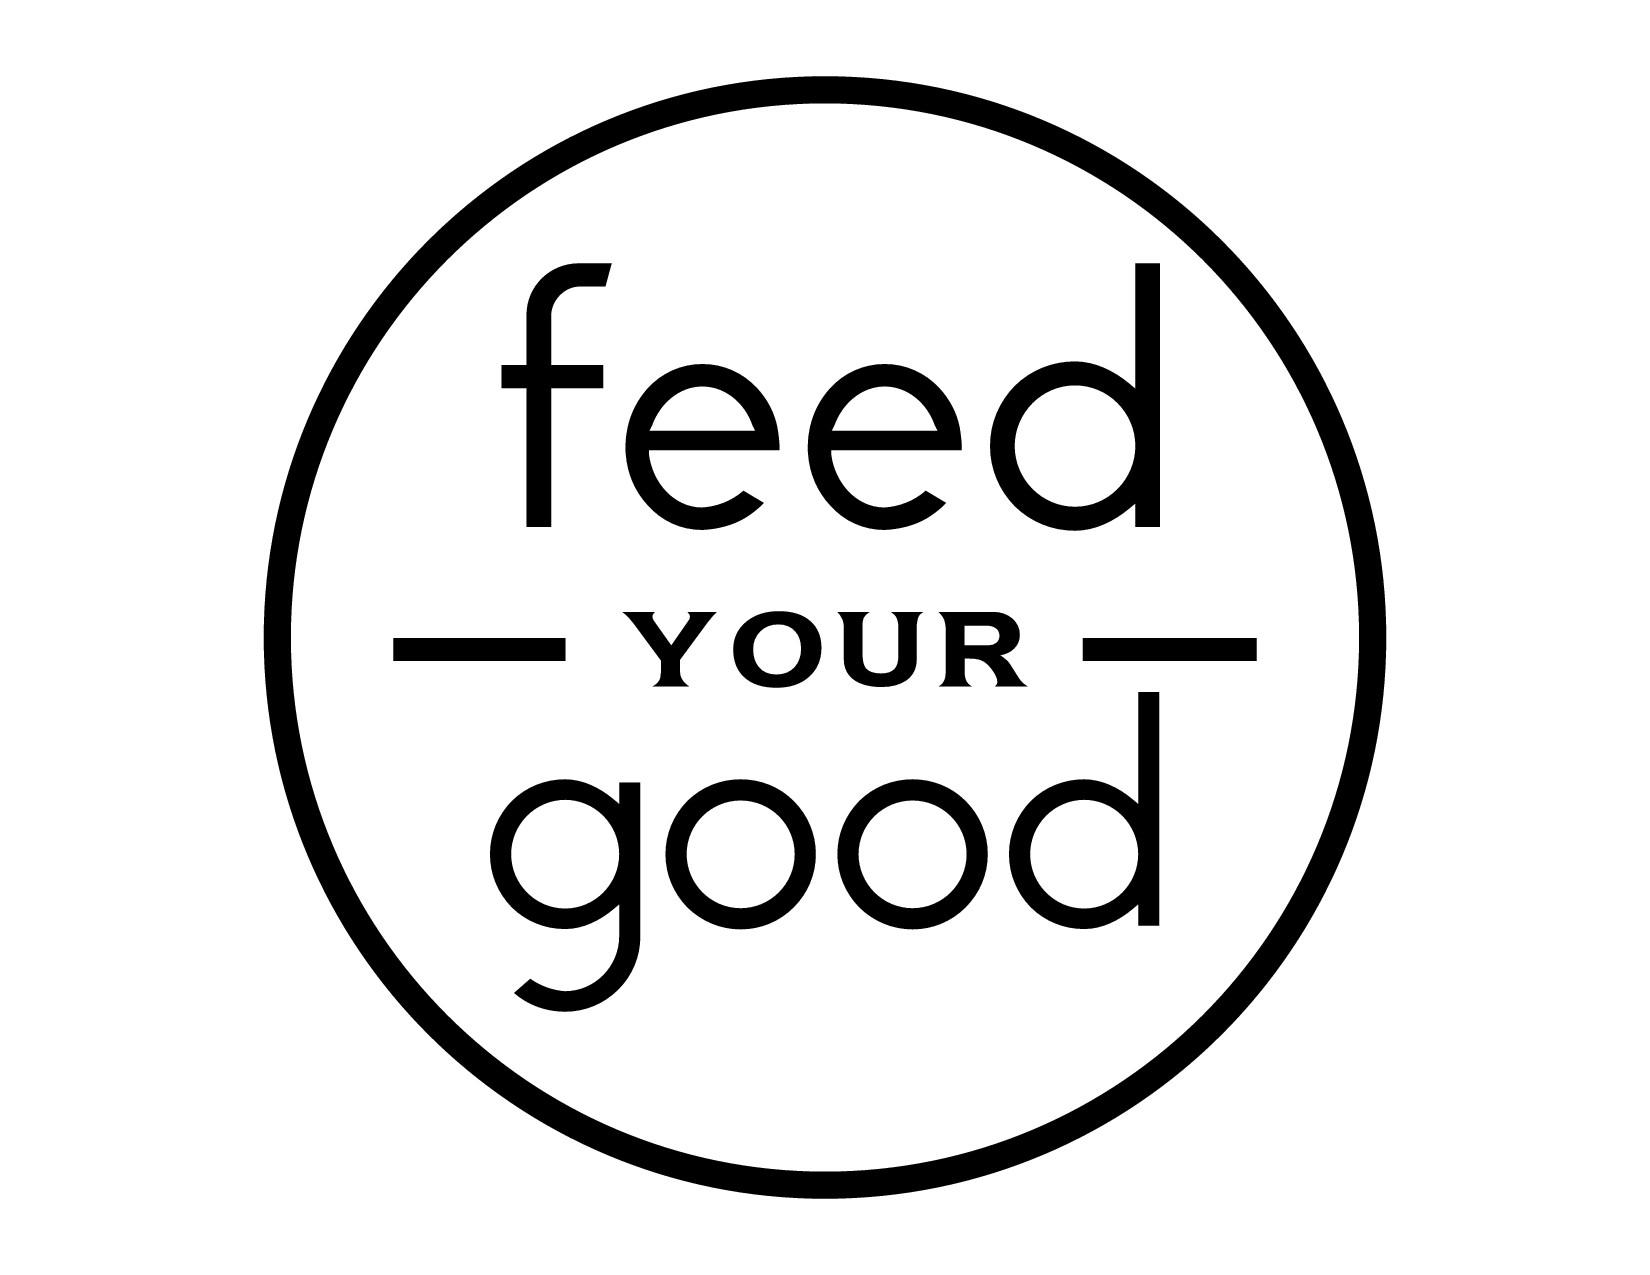 Feed Your Good food blog needs logo